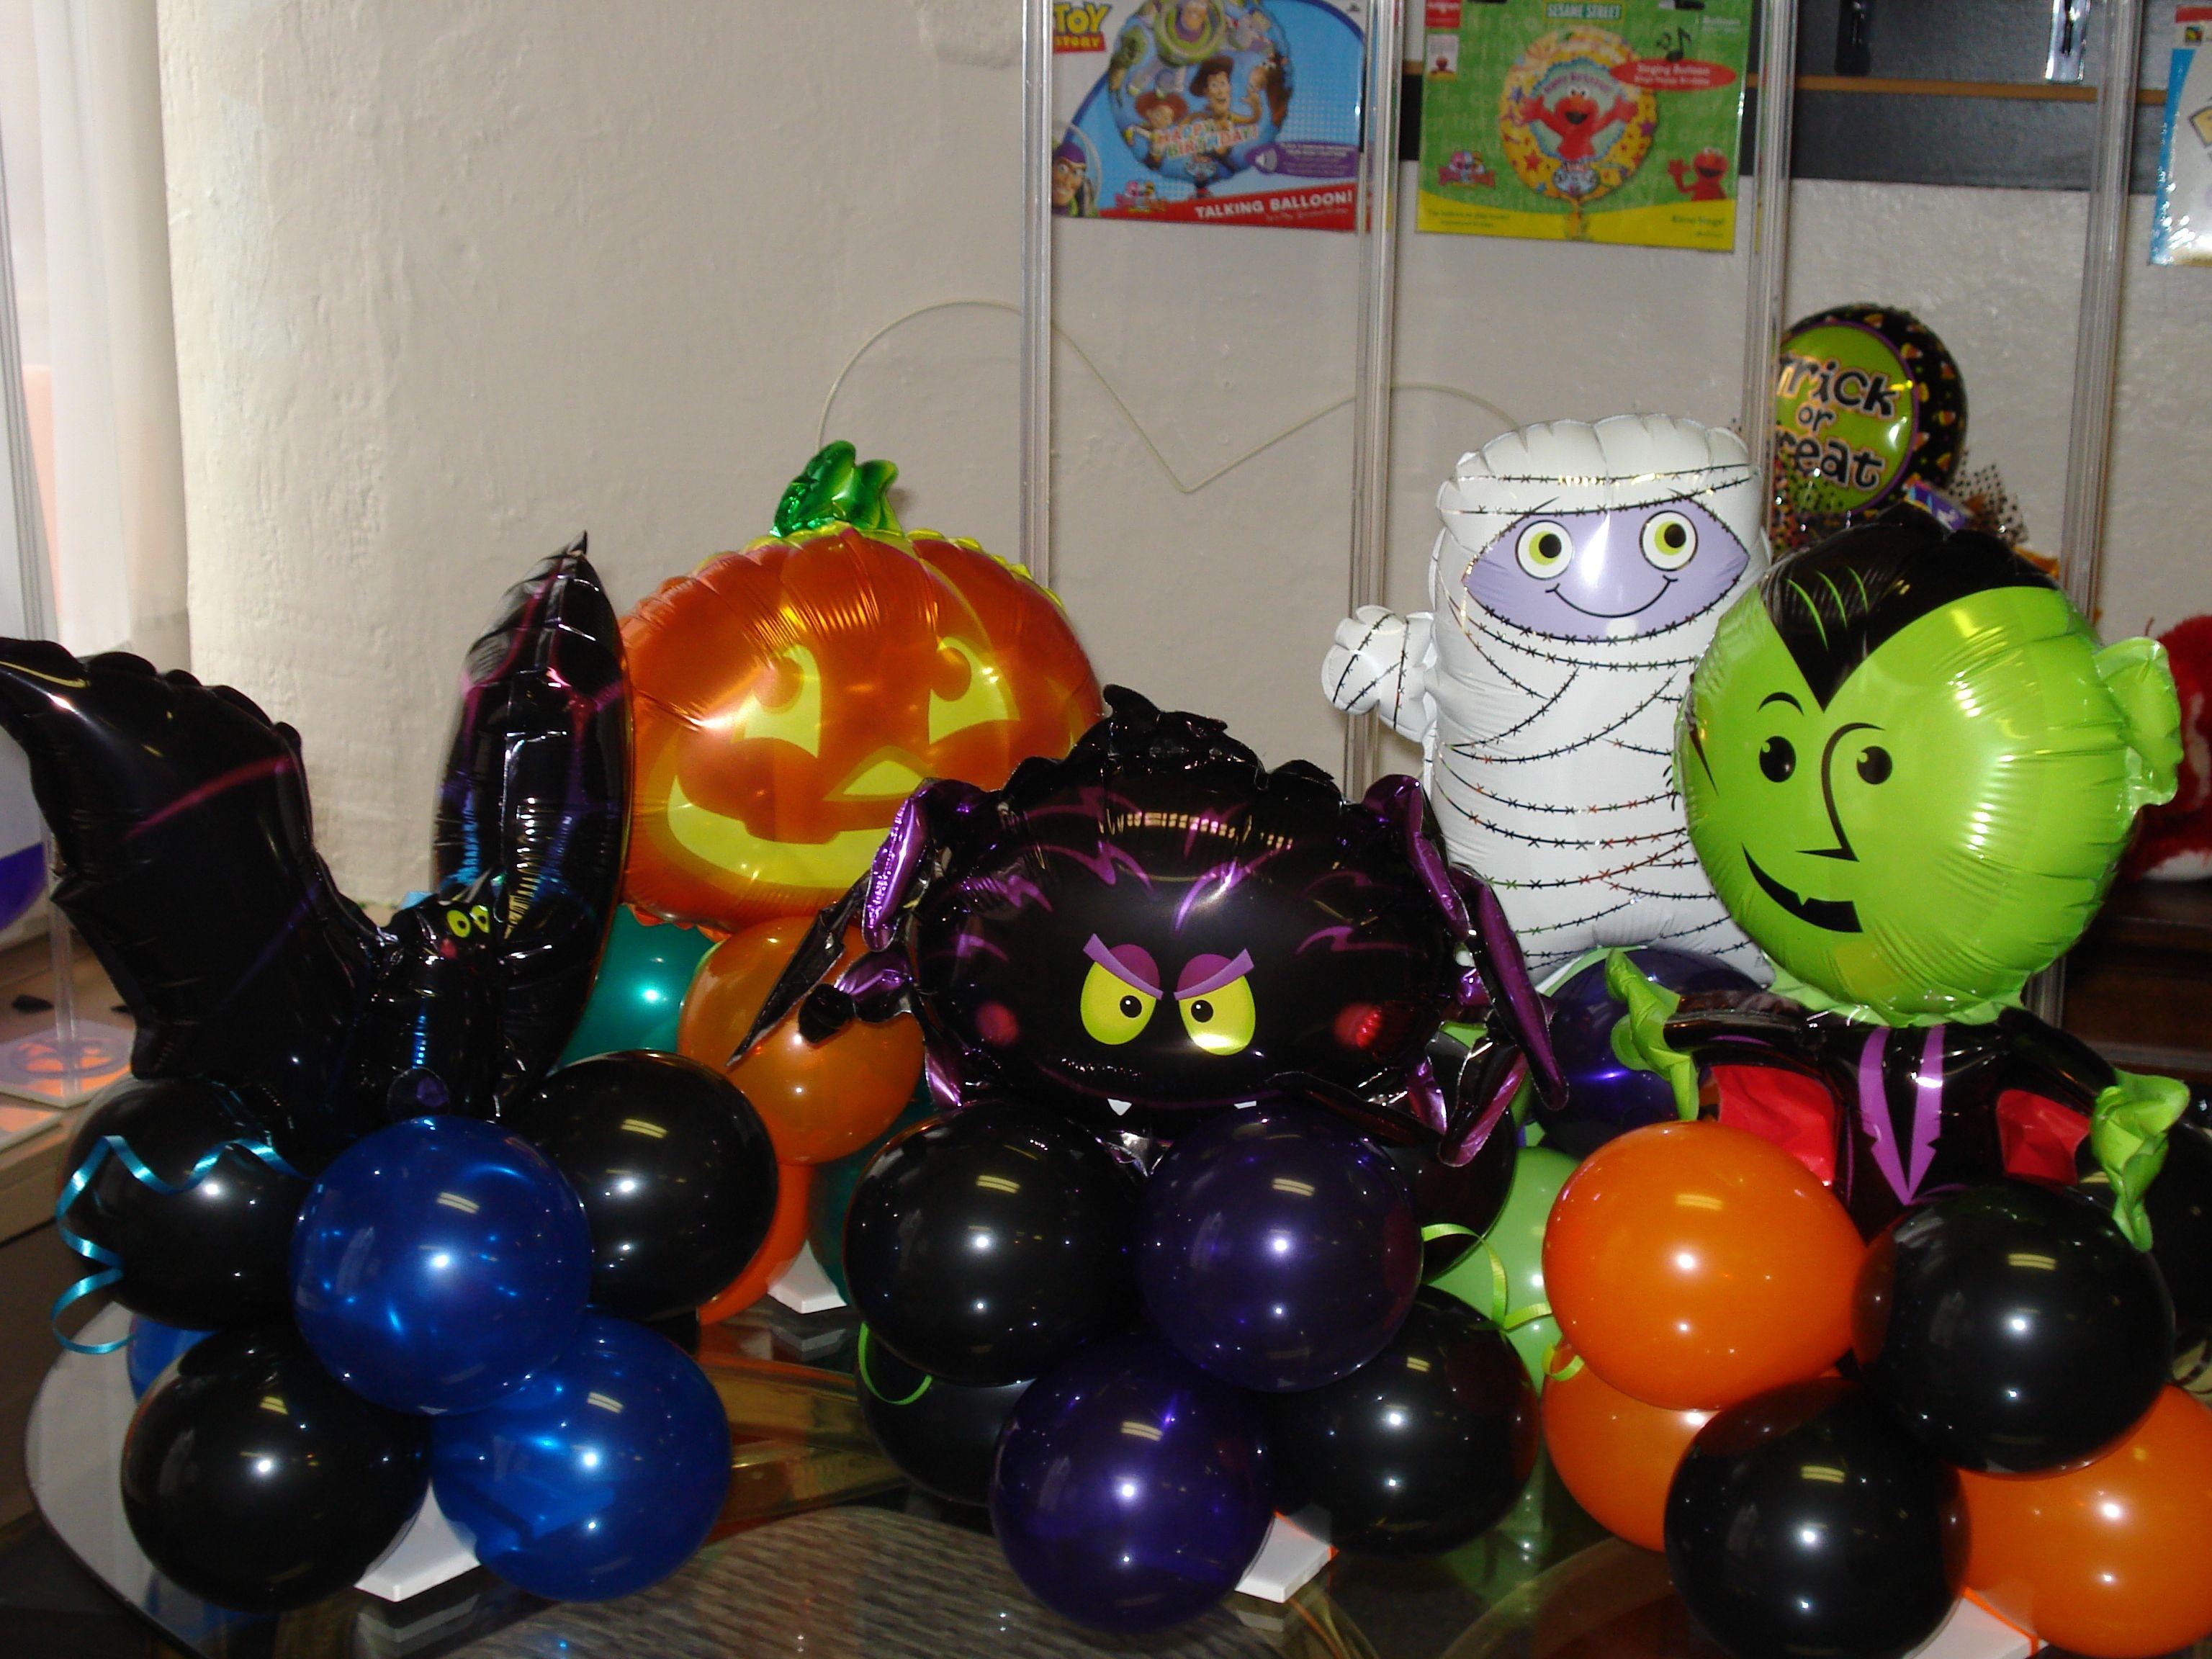 Halloween centerpieces www.balloonatics.info